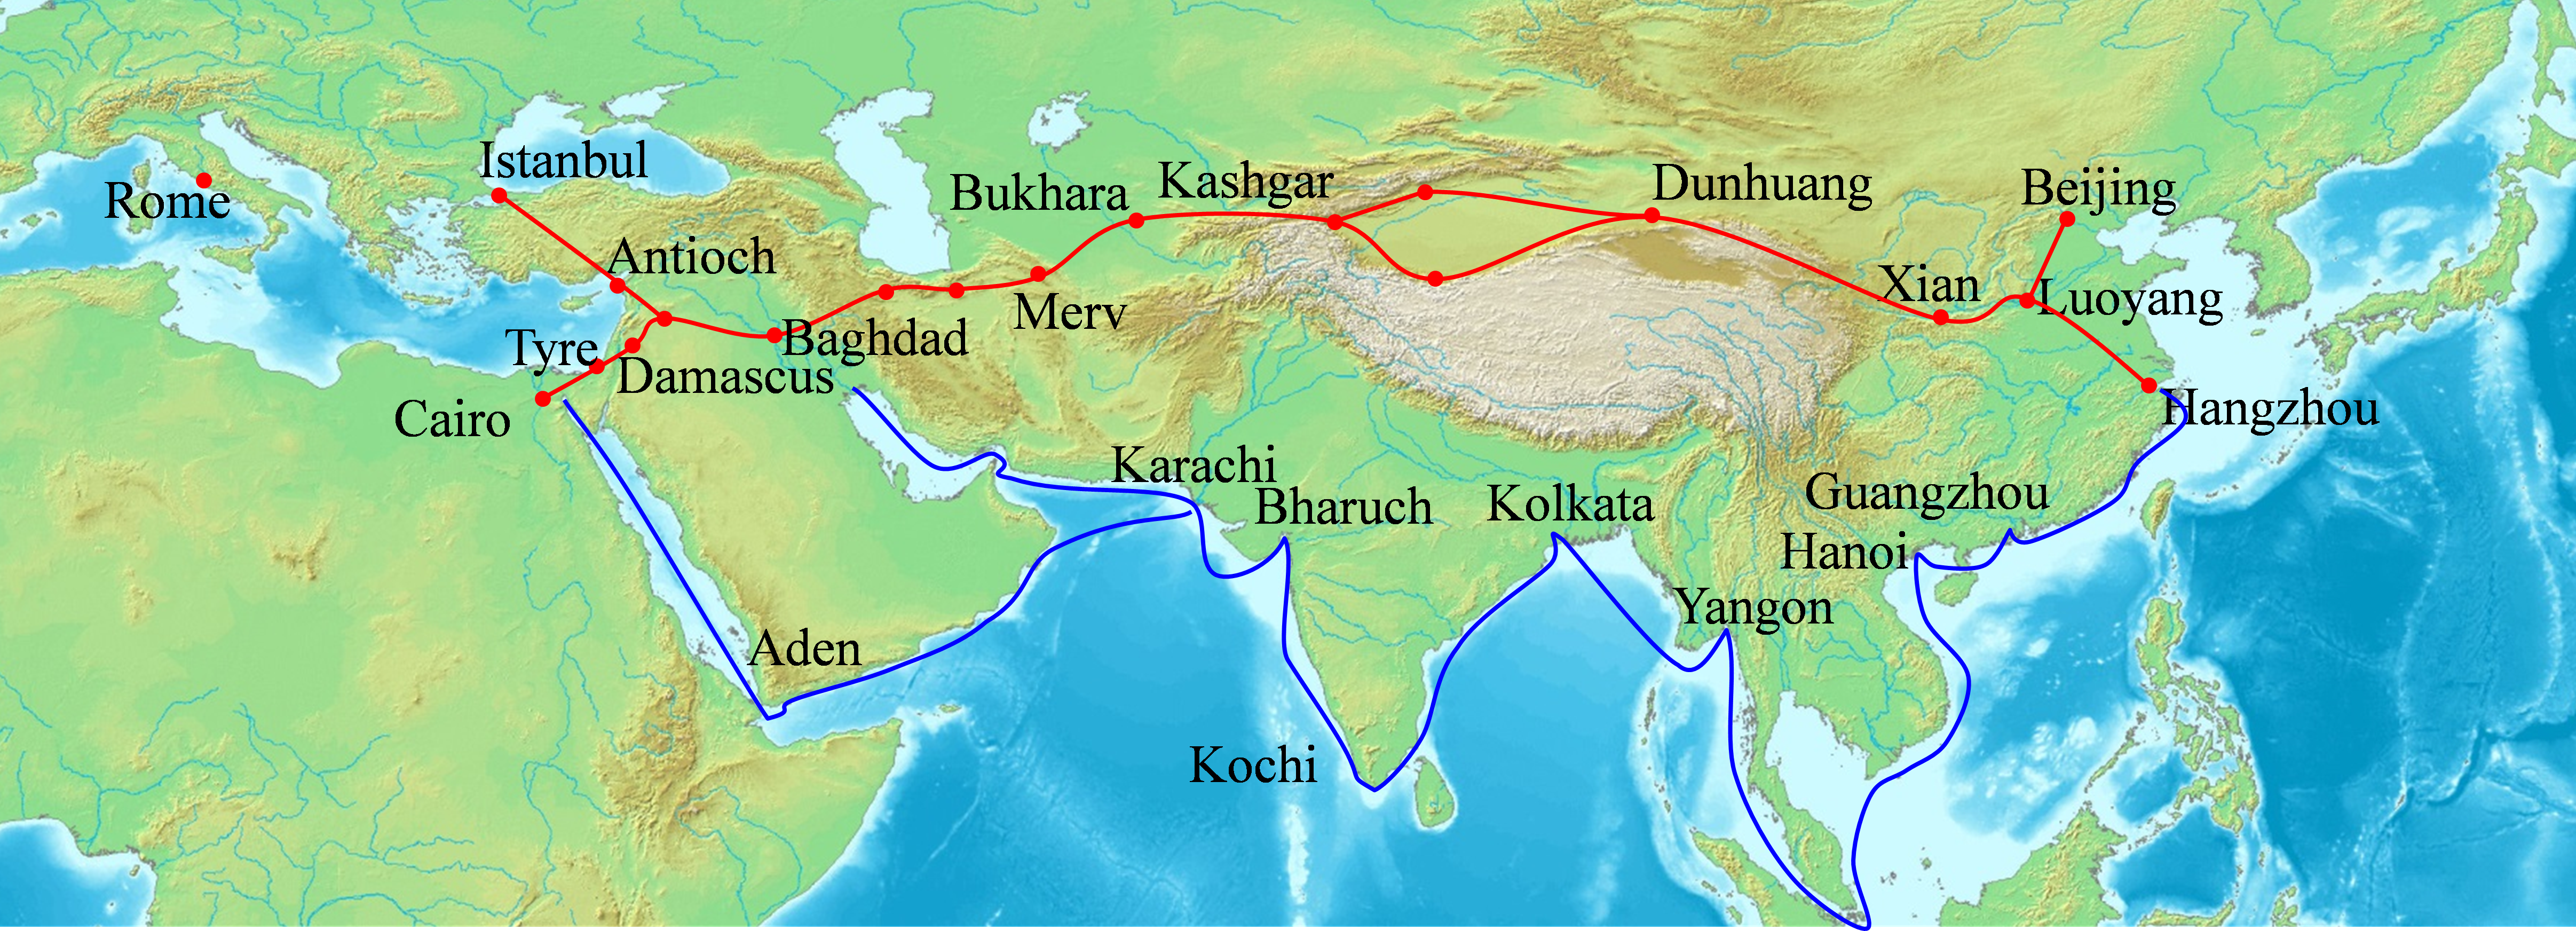 Alt the Silk Road